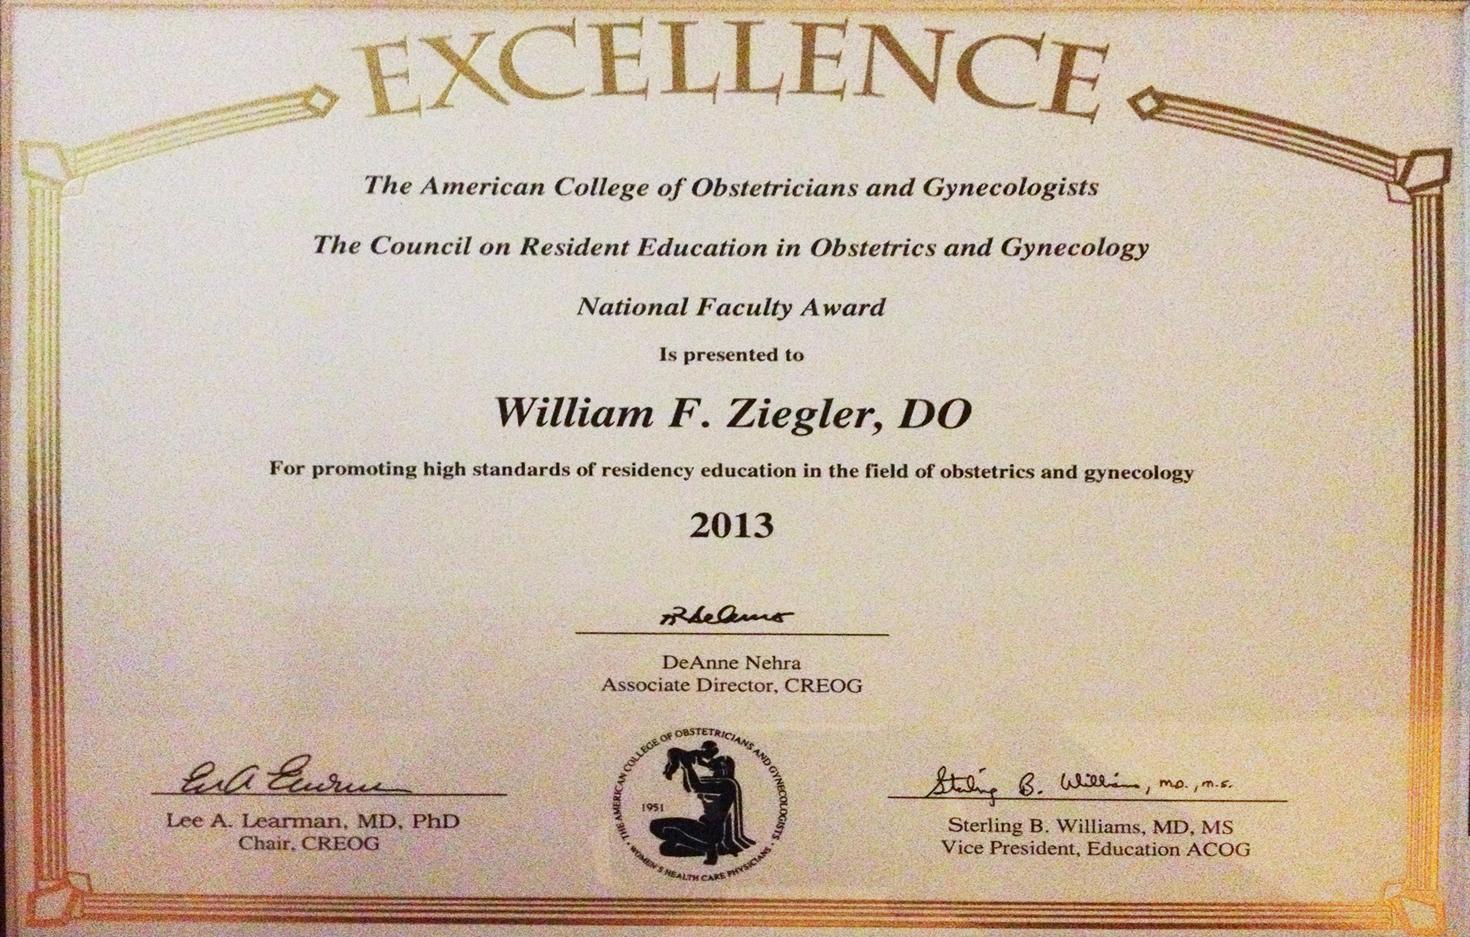 National Faculty Award